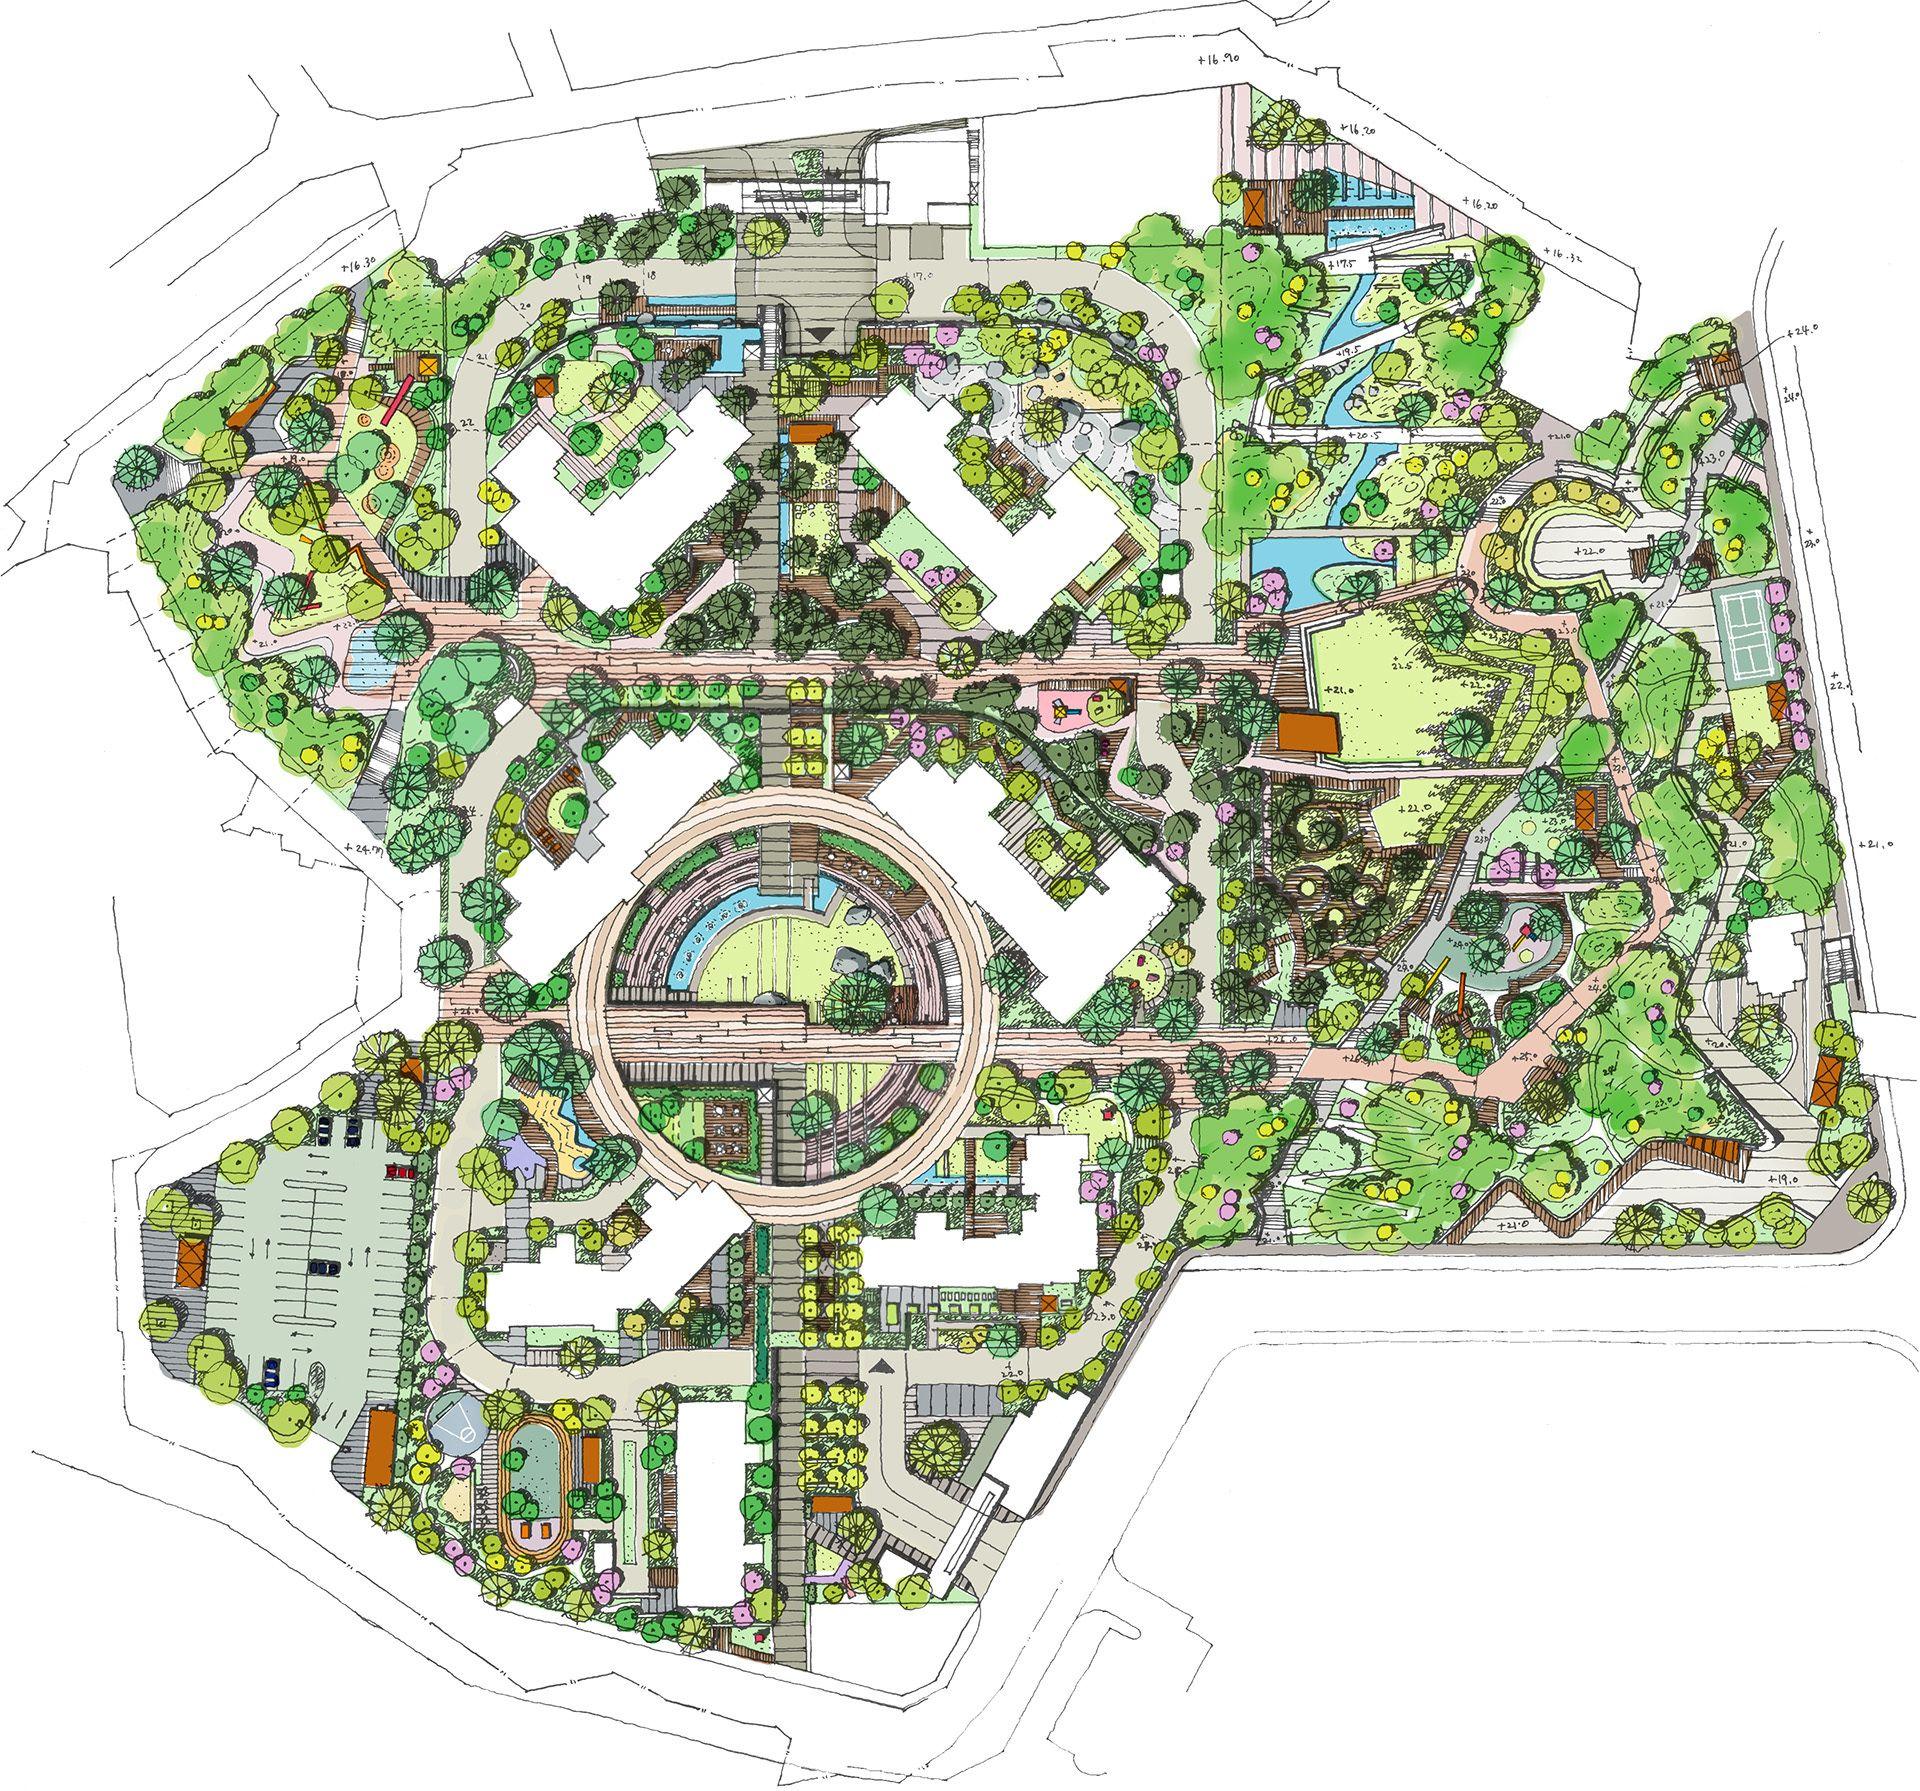 Haengdang Dong Apartment Landscape Design Designed By Studio101 조경 도면 조경 조경설계